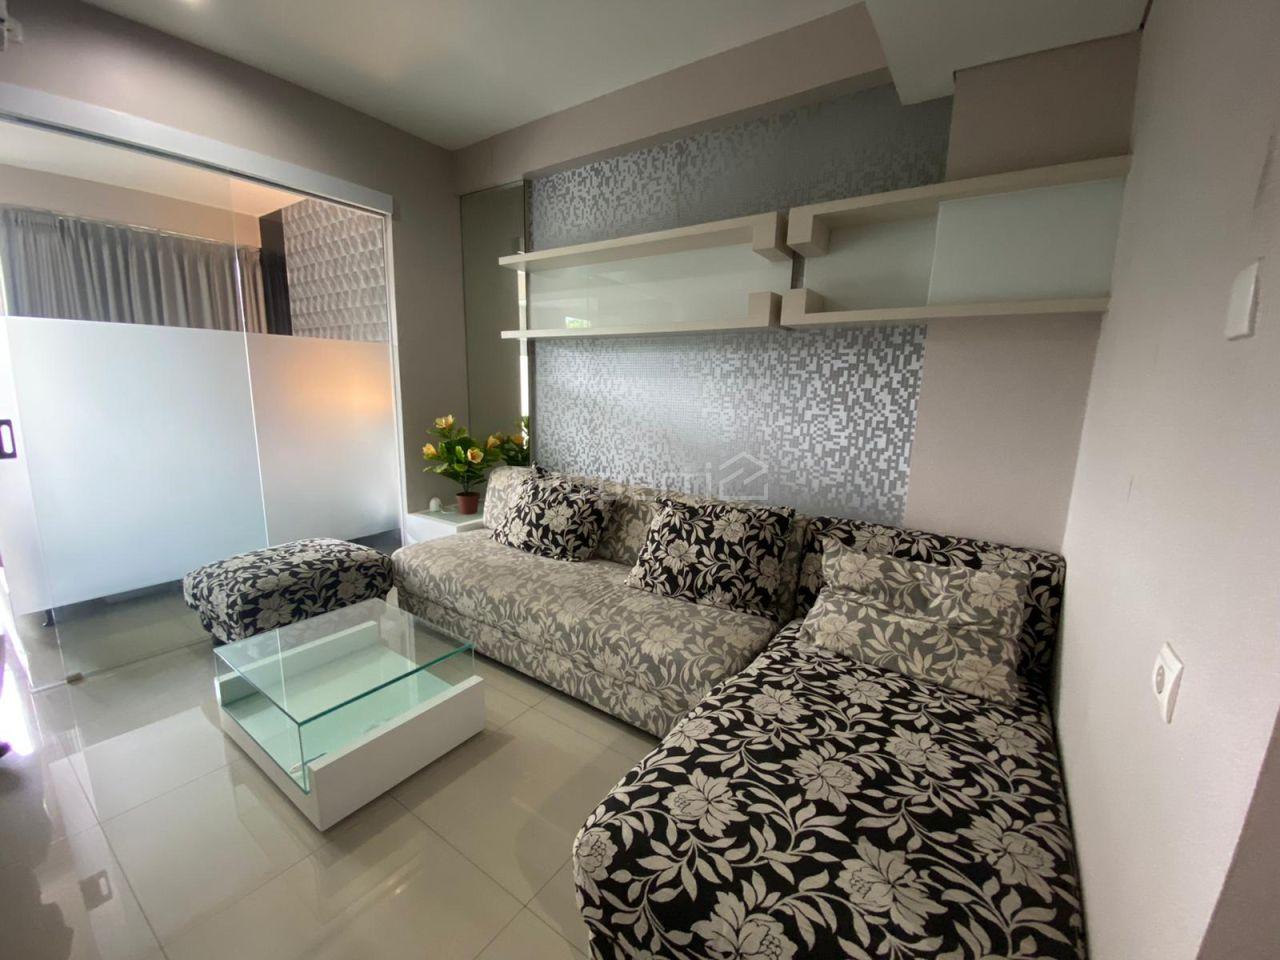 Unit Apartemen 1BR di Dago Suites Apartment, Lantai 1, Kota Bandung